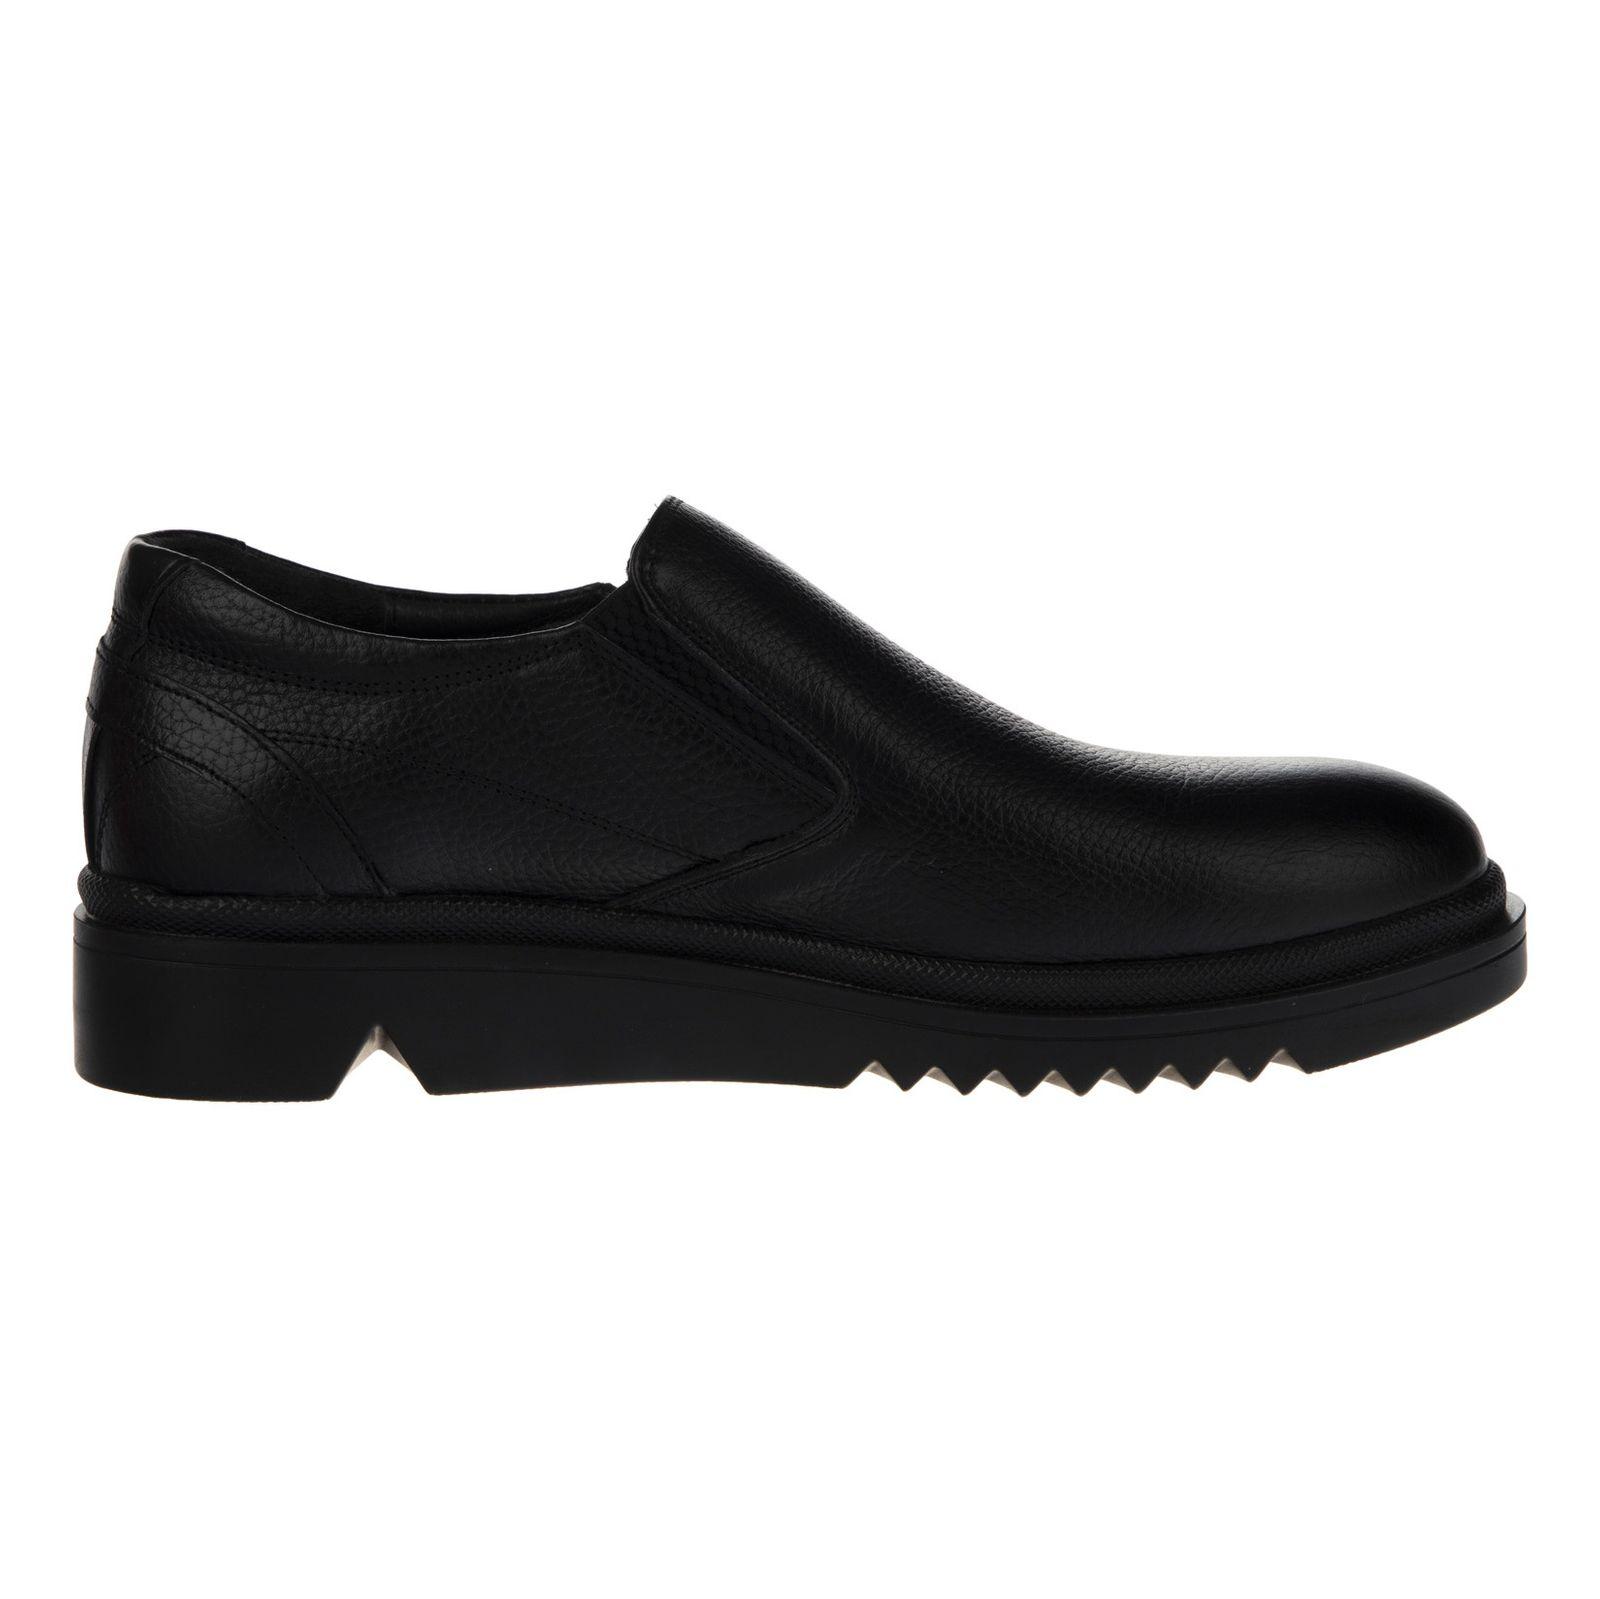 کفش روزمره مردانه شیفر مدل 7160A-101 -  - 6